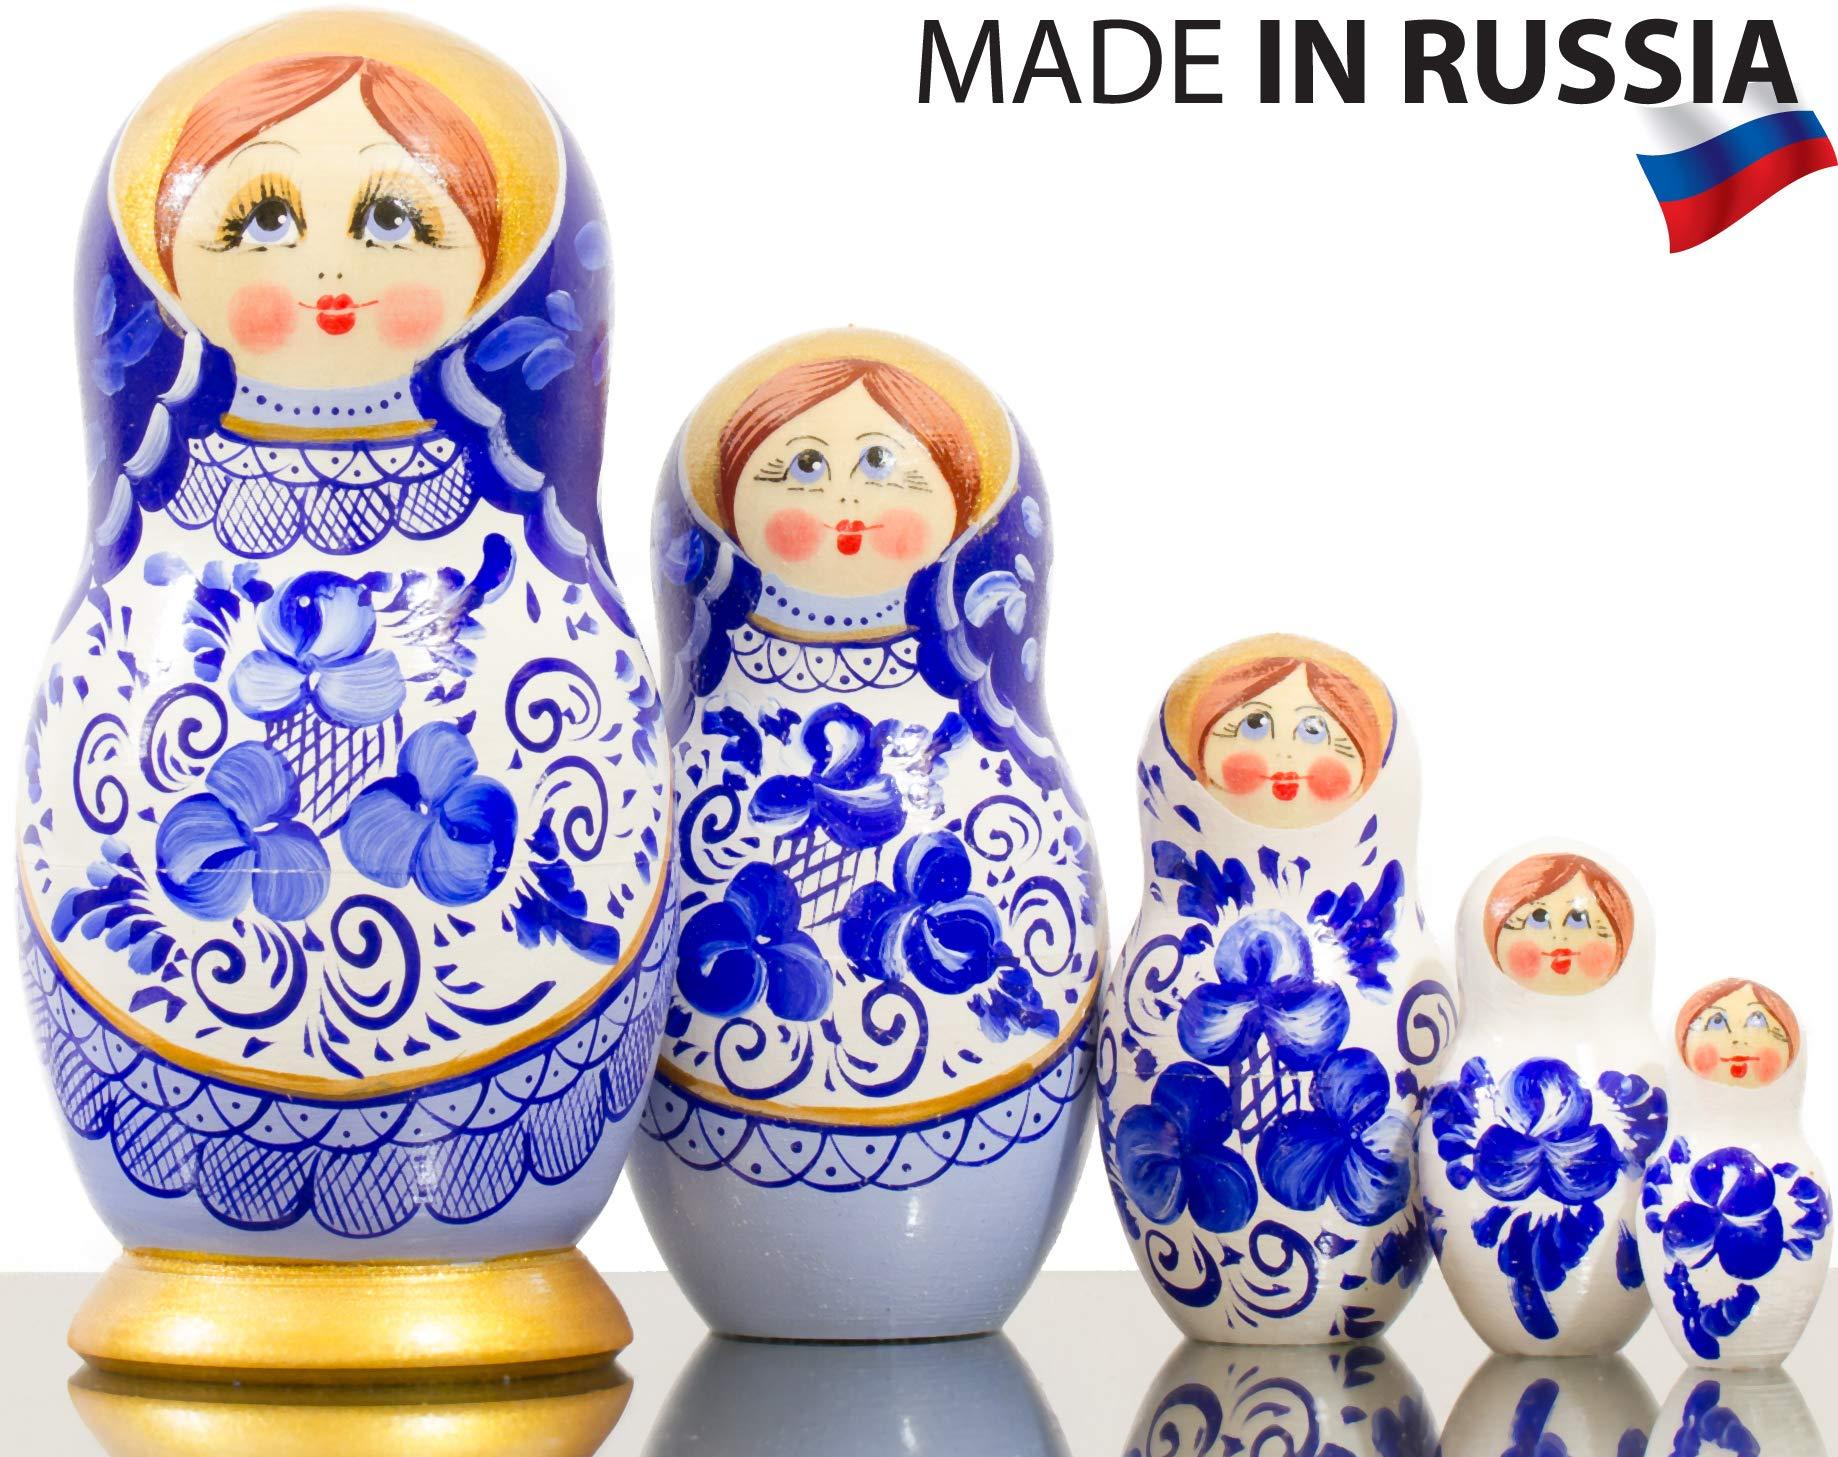 Nesting Doll - Russian Village - Hand Painted in Russia - Big Size - Wooden Decoration Gift Doll - Matryoshka Babushka (Style B, 6.75``(5 Dolls in 1))